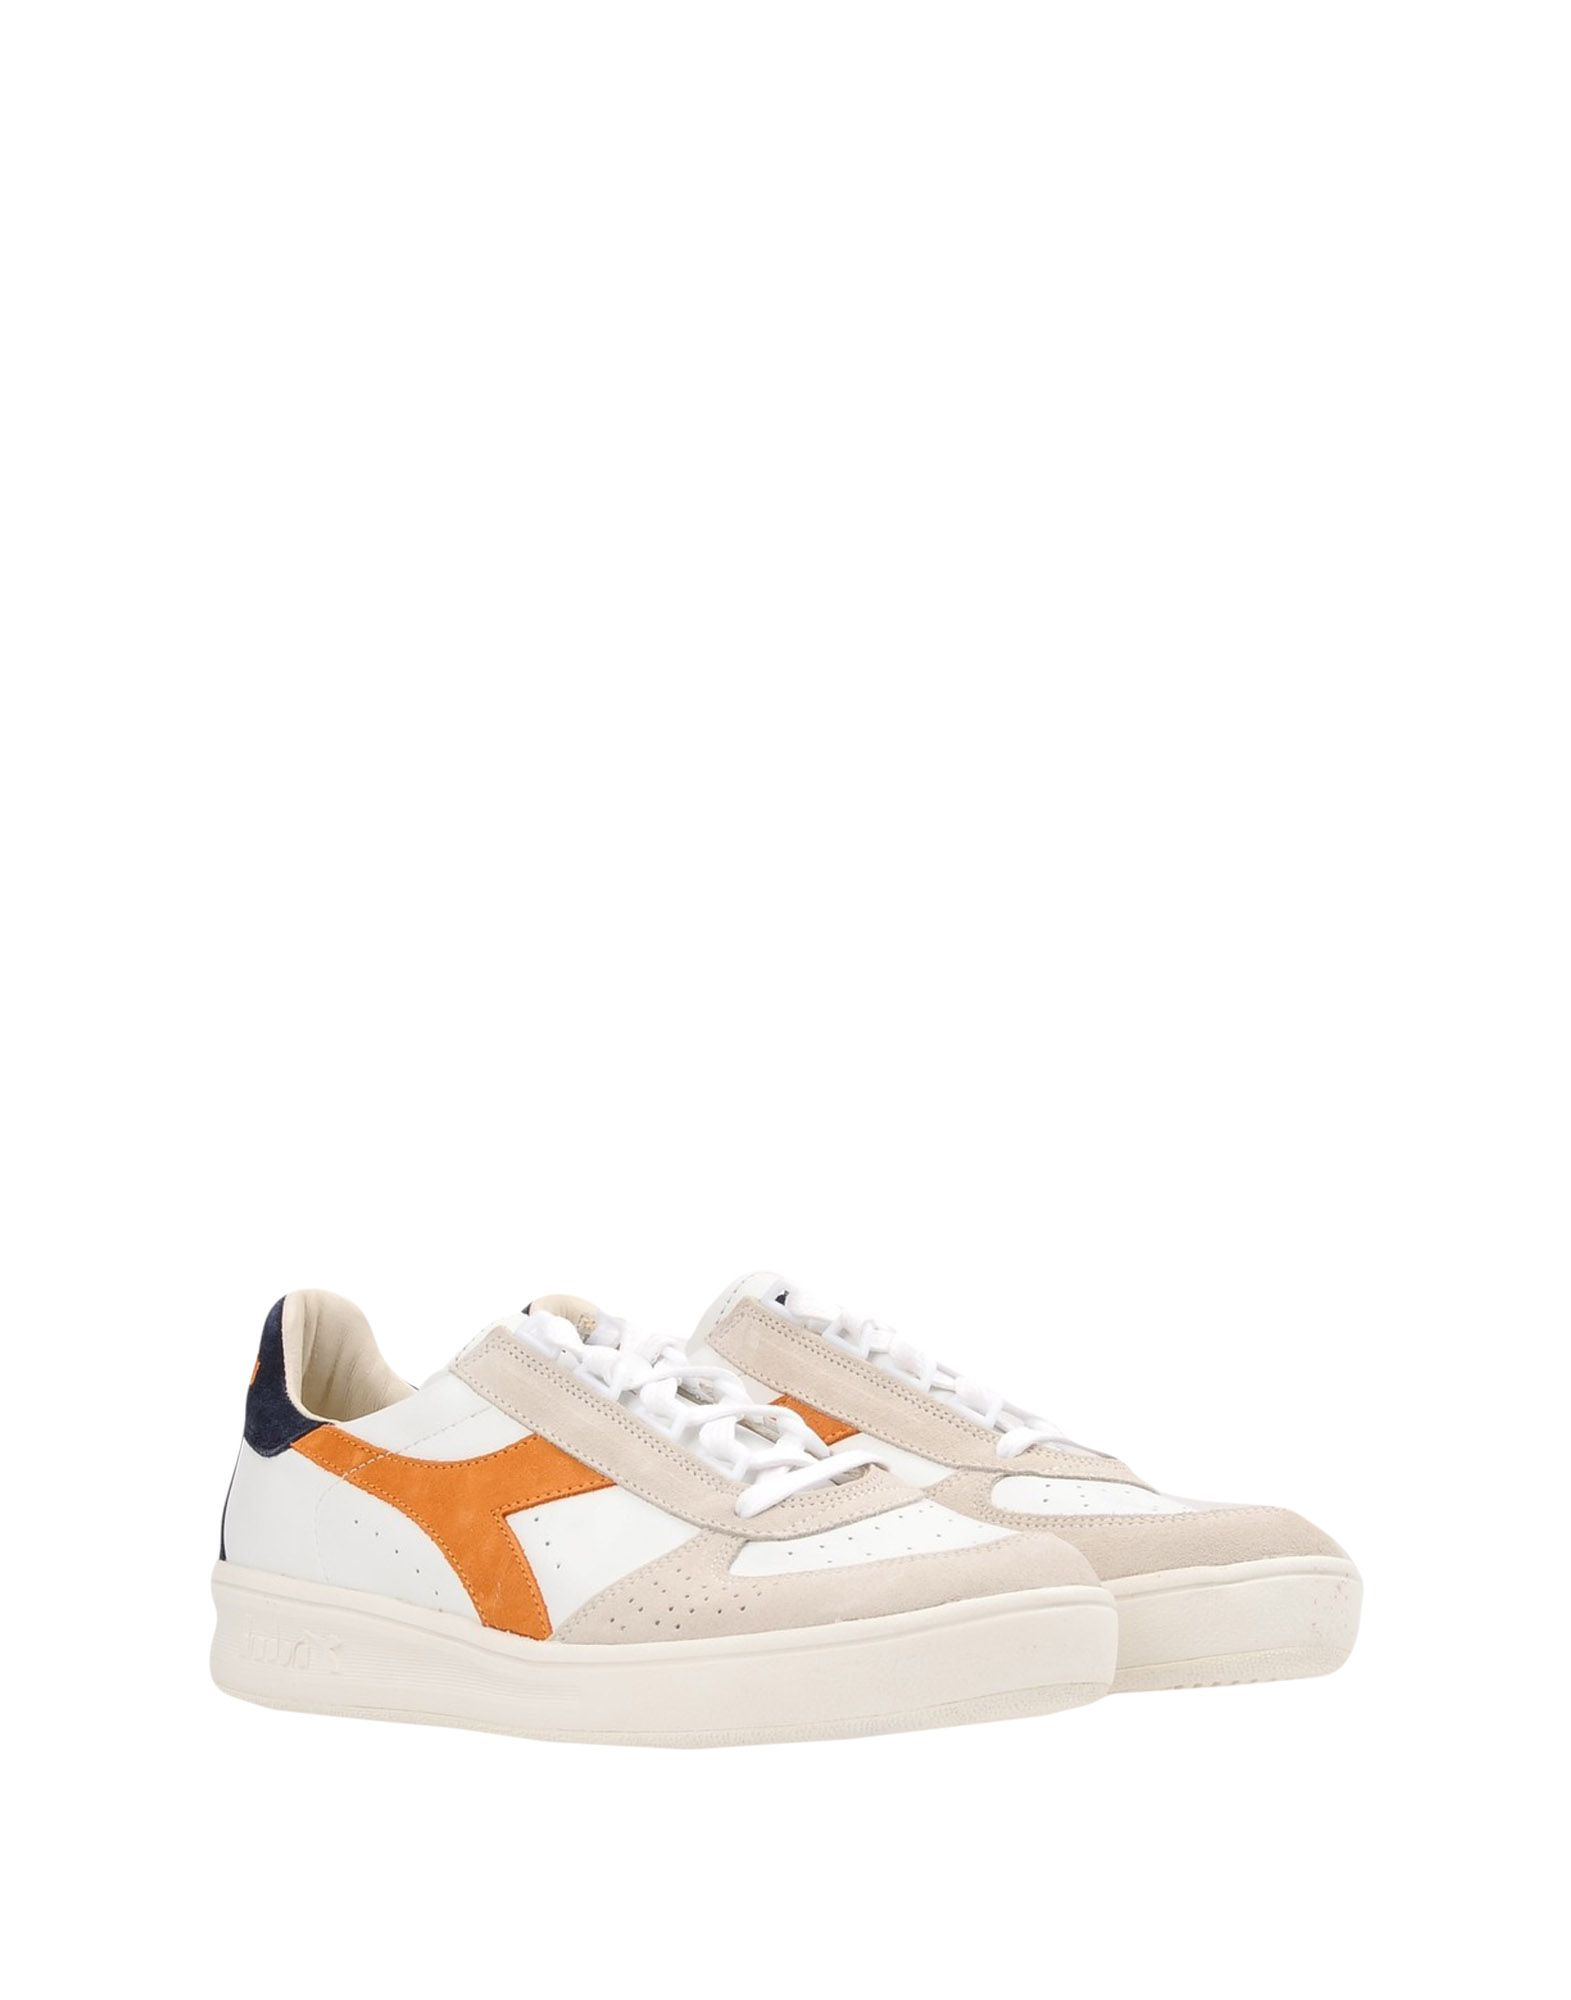 Diadora Heritage 11368855HH B.Elite S L  11368855HH Heritage Gute Qualität beliebte Schuhe 15ada4